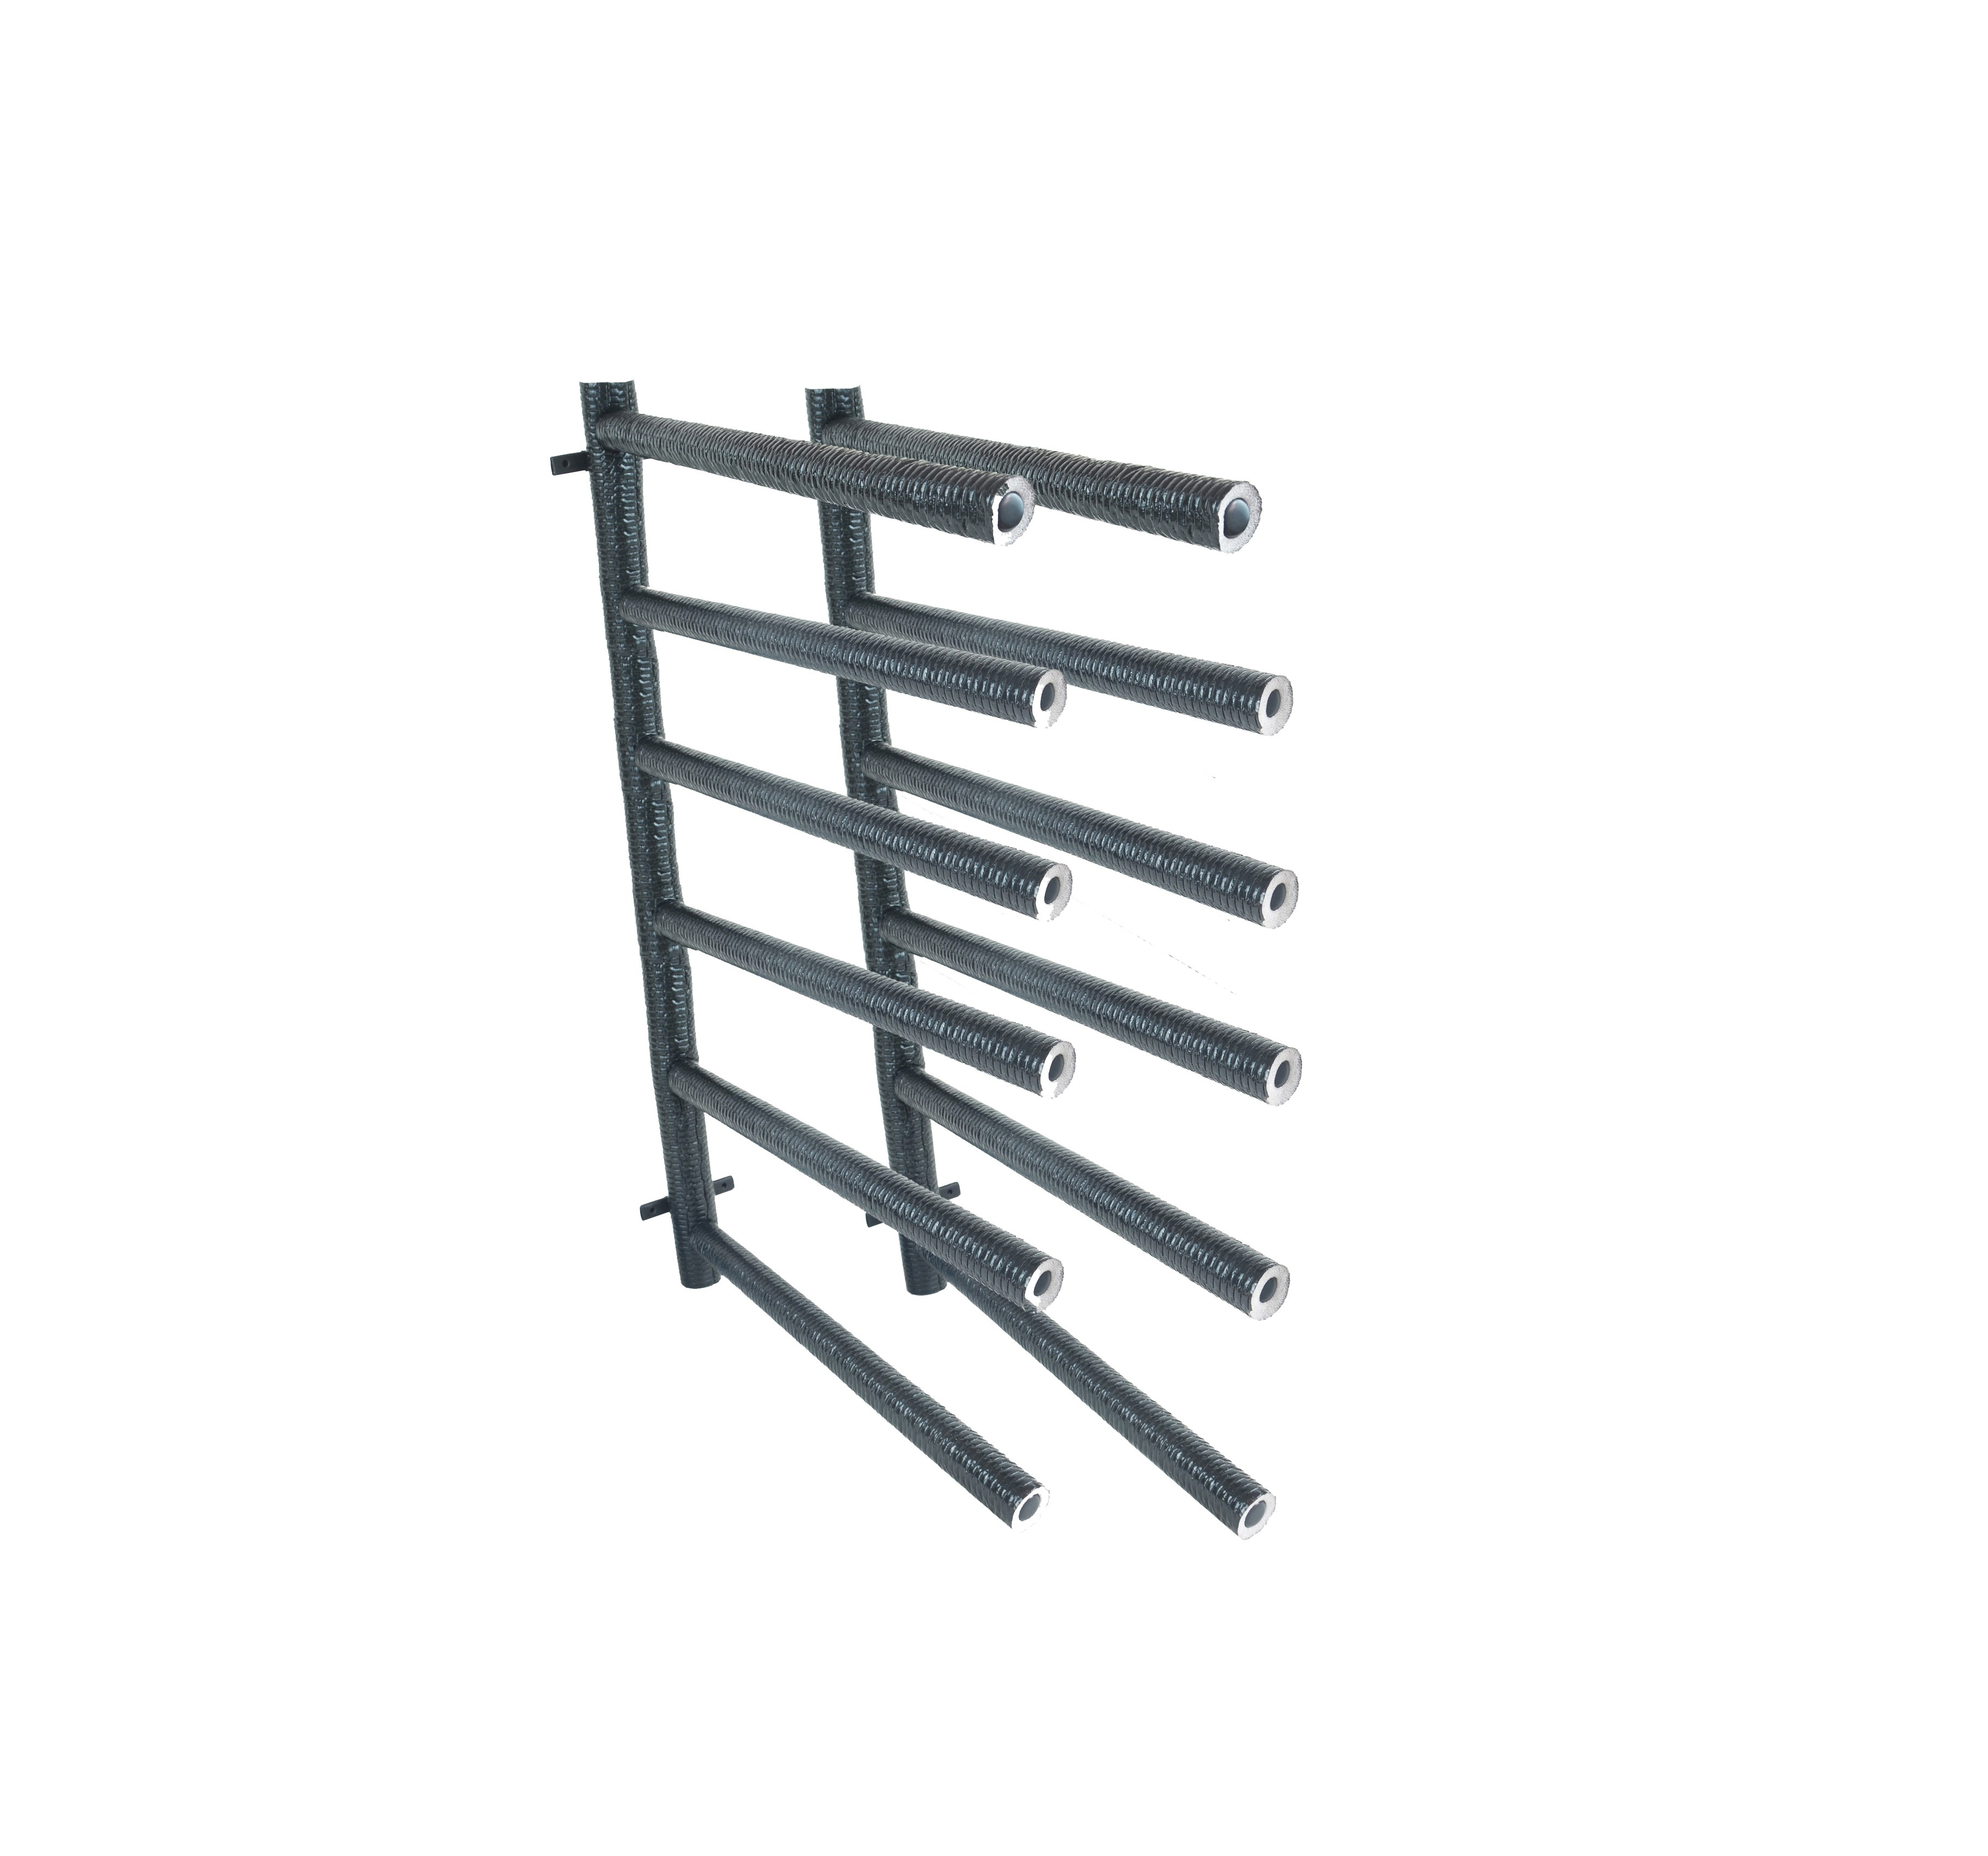 Rack Para 6 Prancha Stand Up Paddle - Horizontal | PranchariaRack Para 6 Prancha Stand Up Paddle - Horizontal | Prancharia